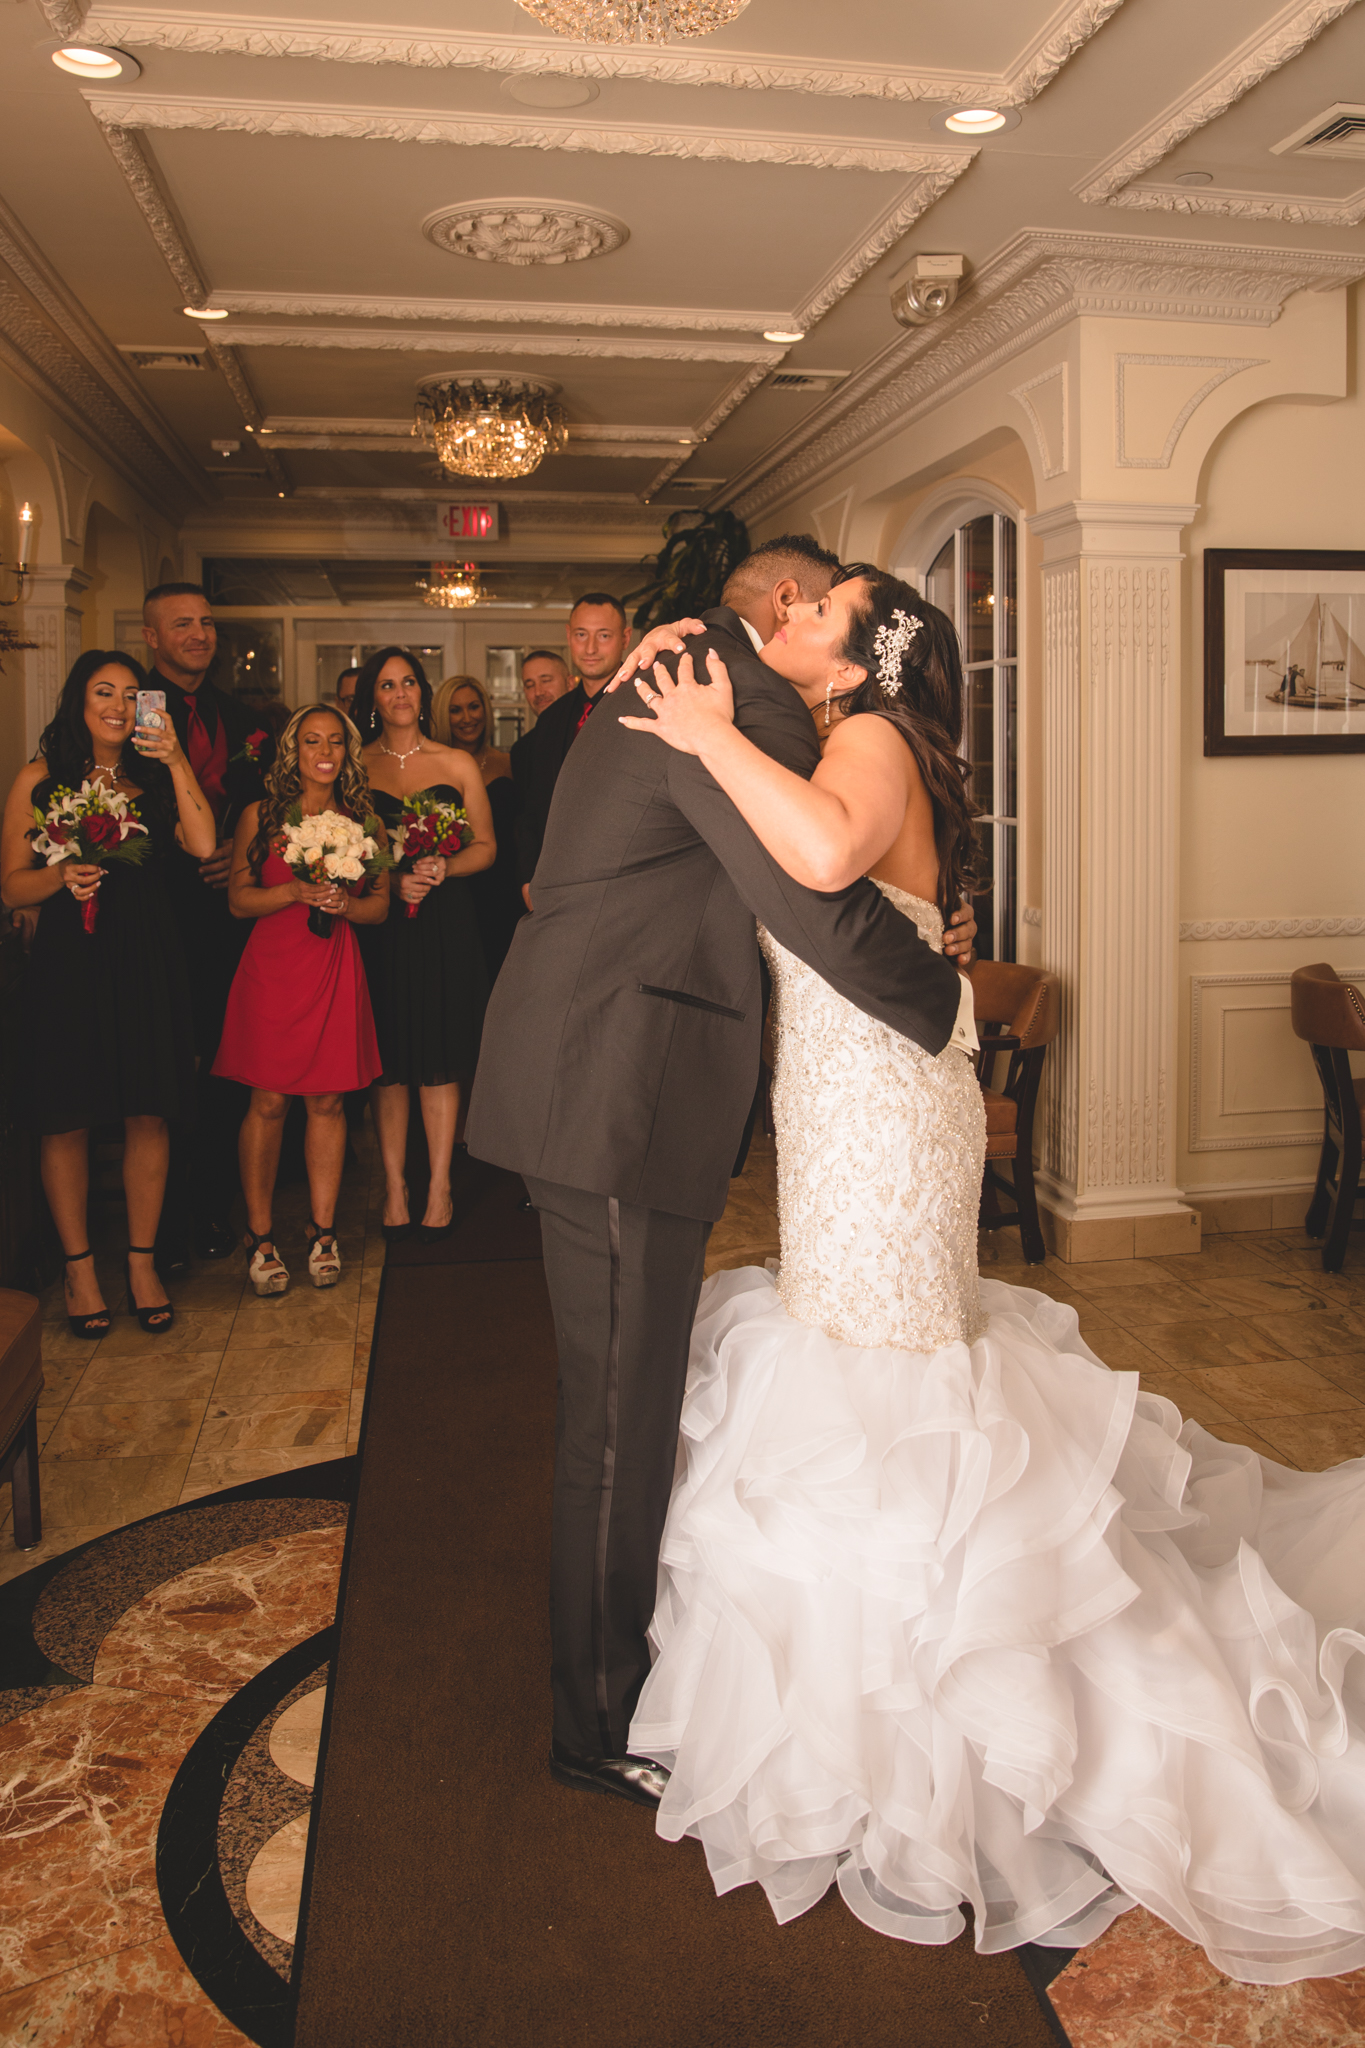 Long Island Wedding Photographer Shannon Lee Photography-13.jpg